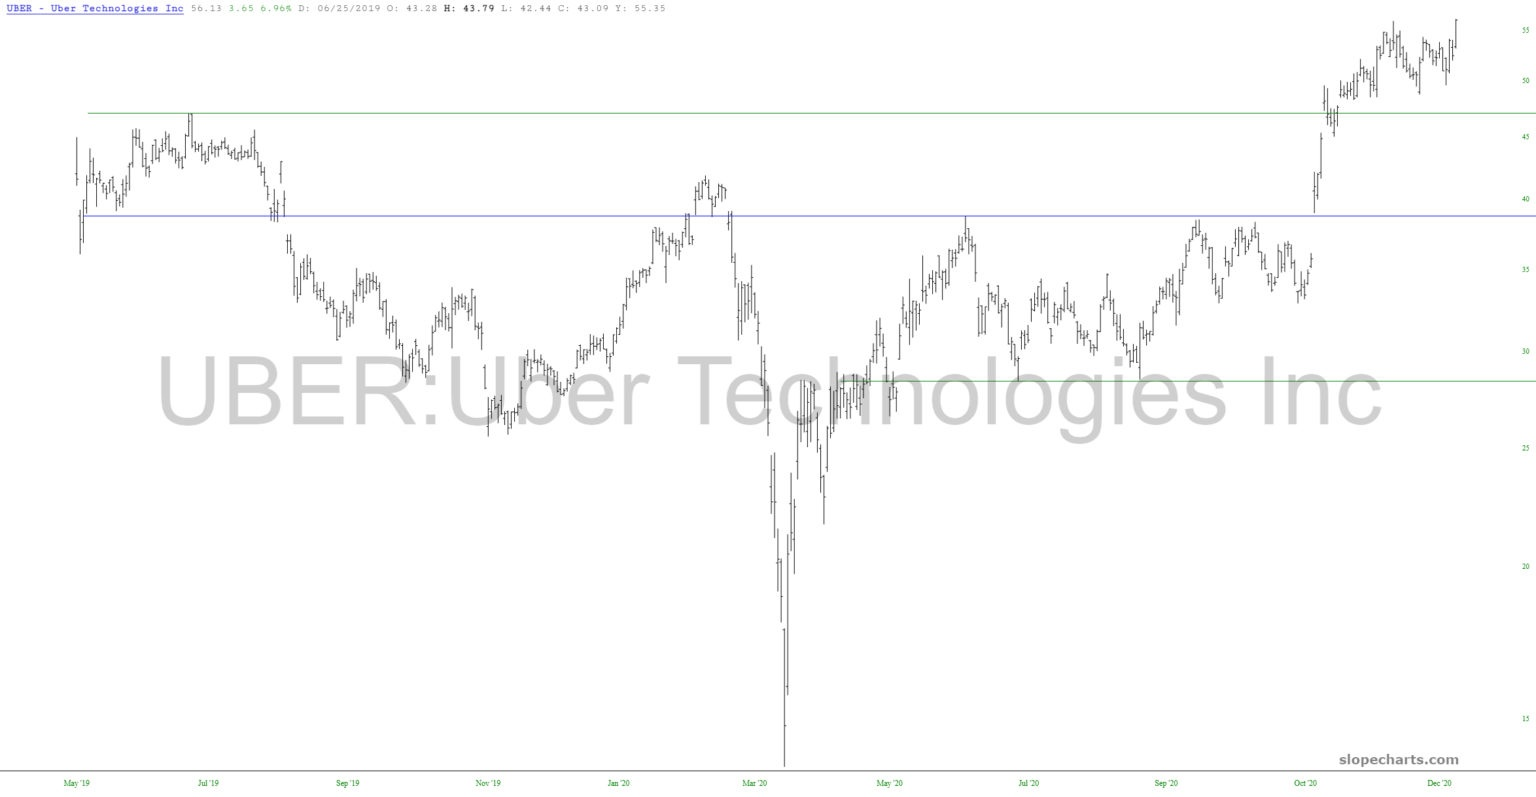 Uber Chart.